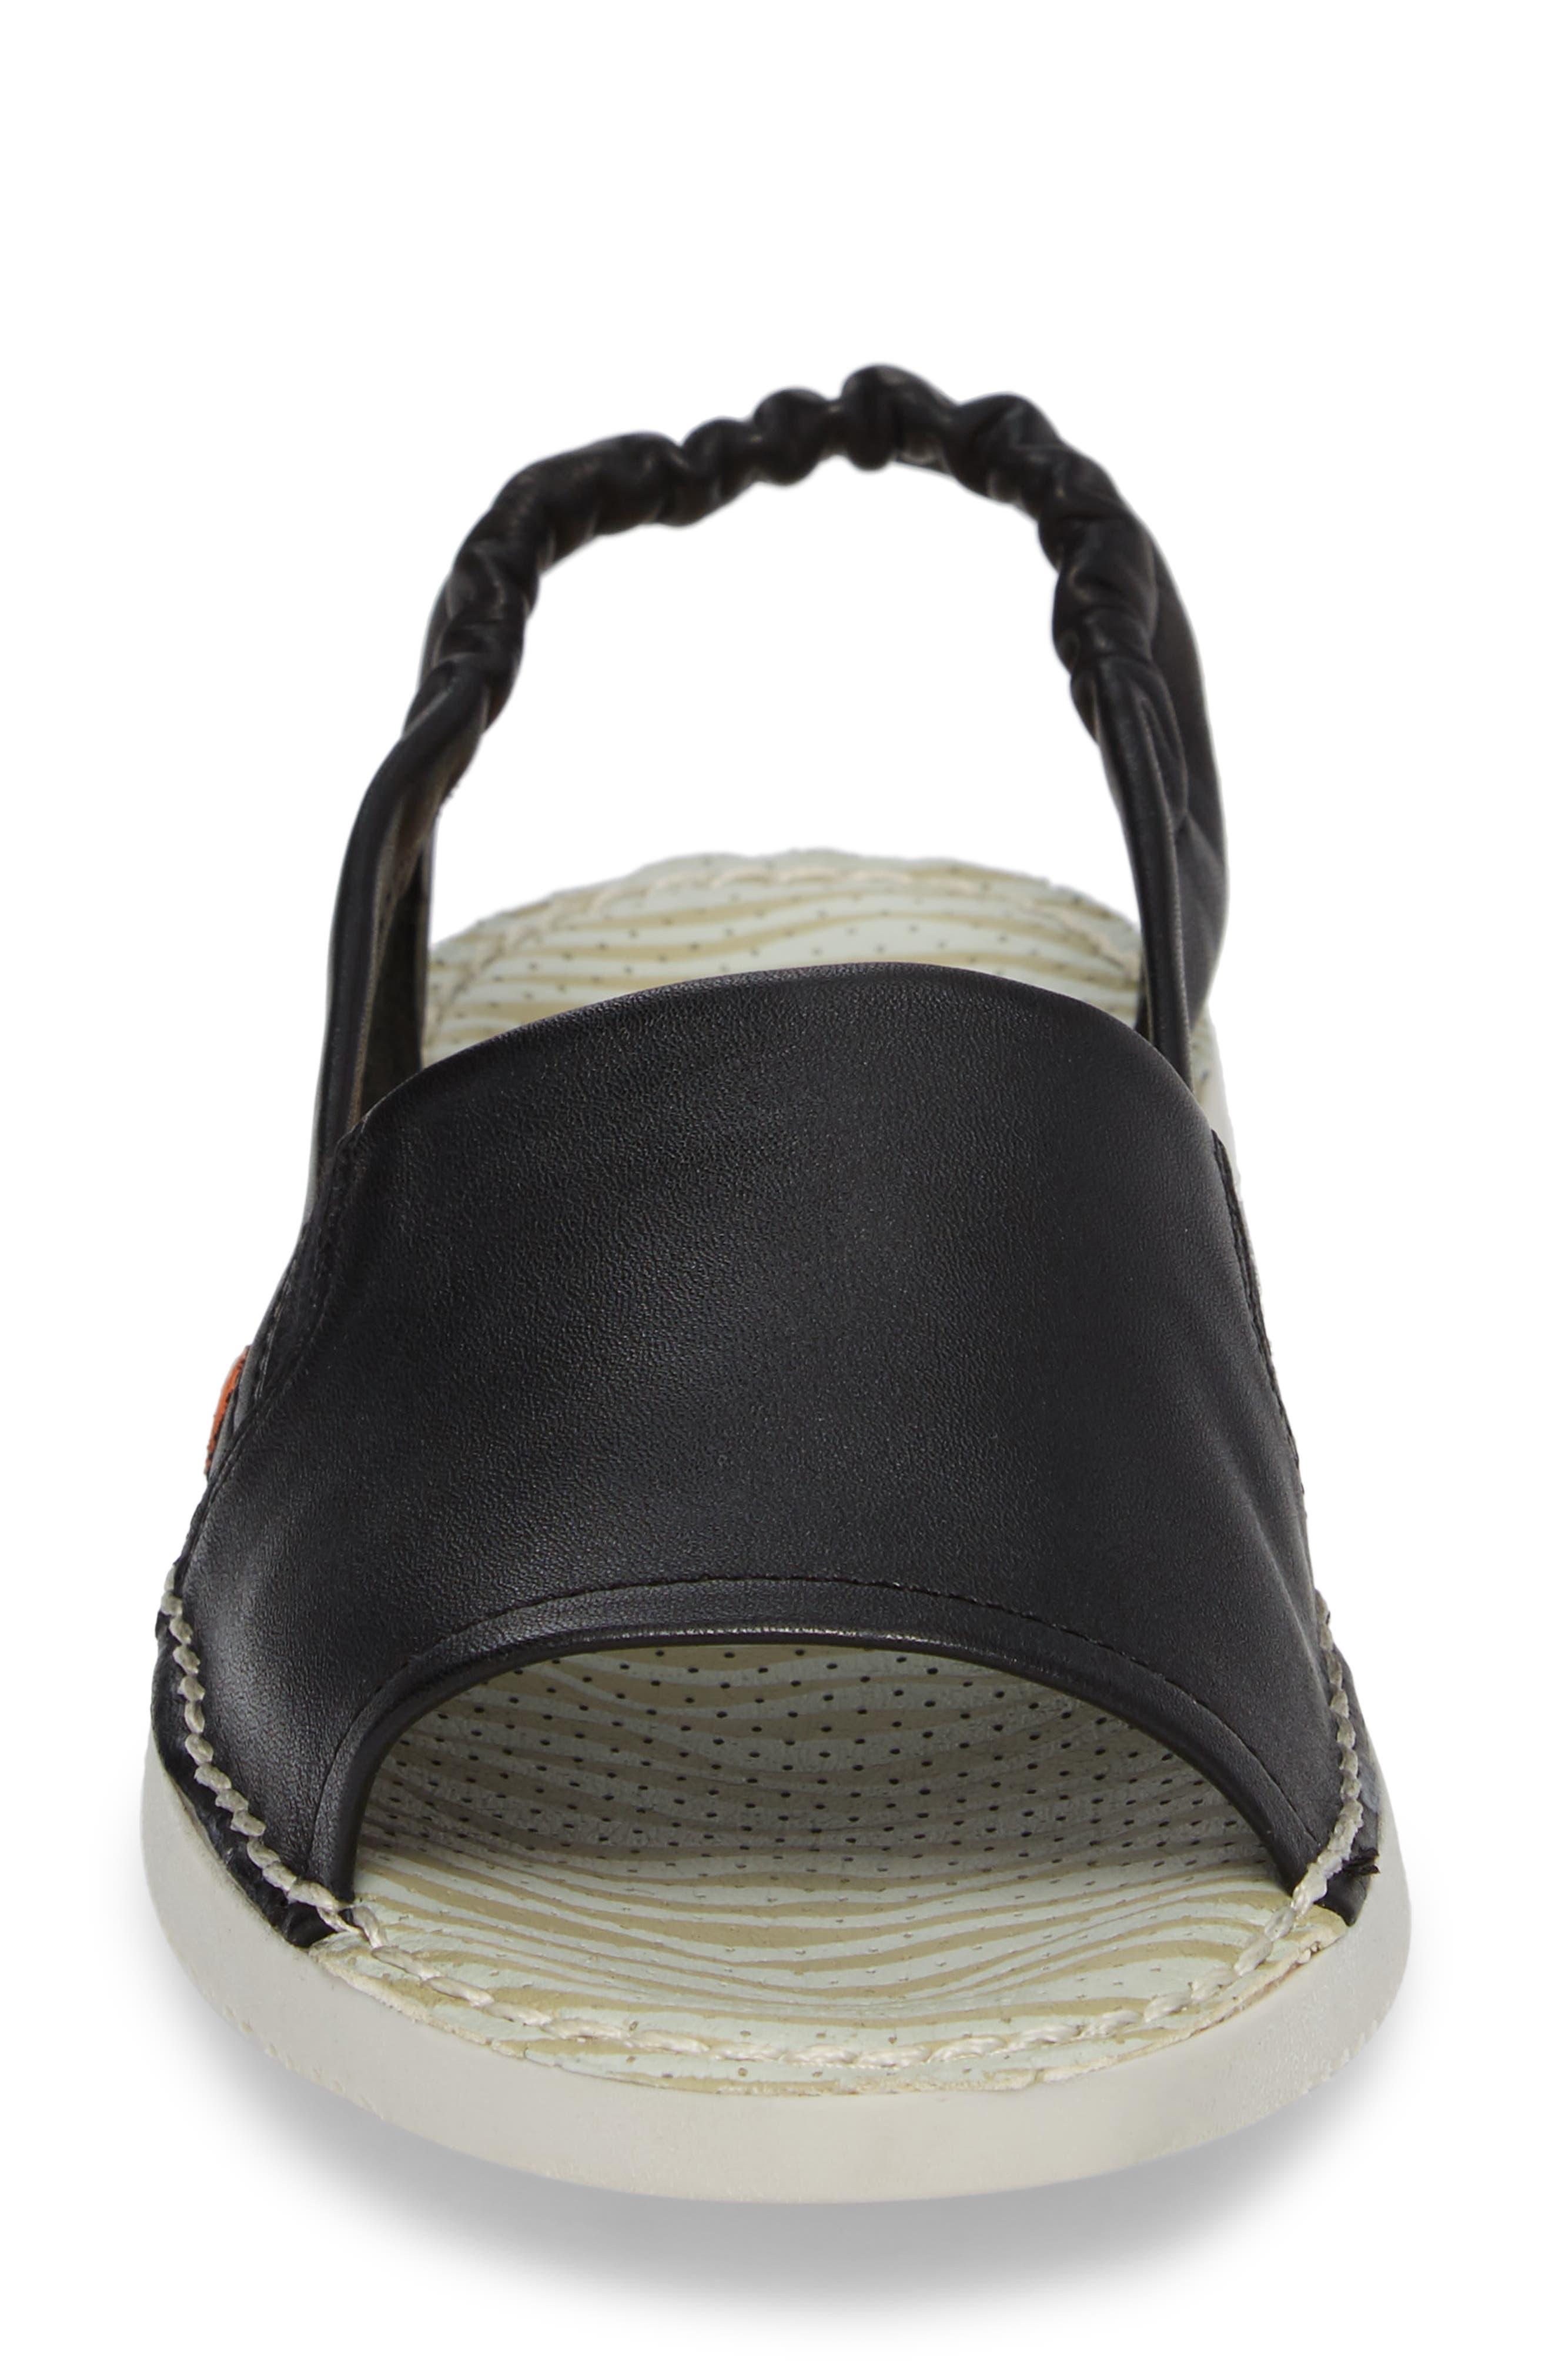 Tee Flat Sandal,                             Alternate thumbnail 4, color,                             BLACK LEATHER